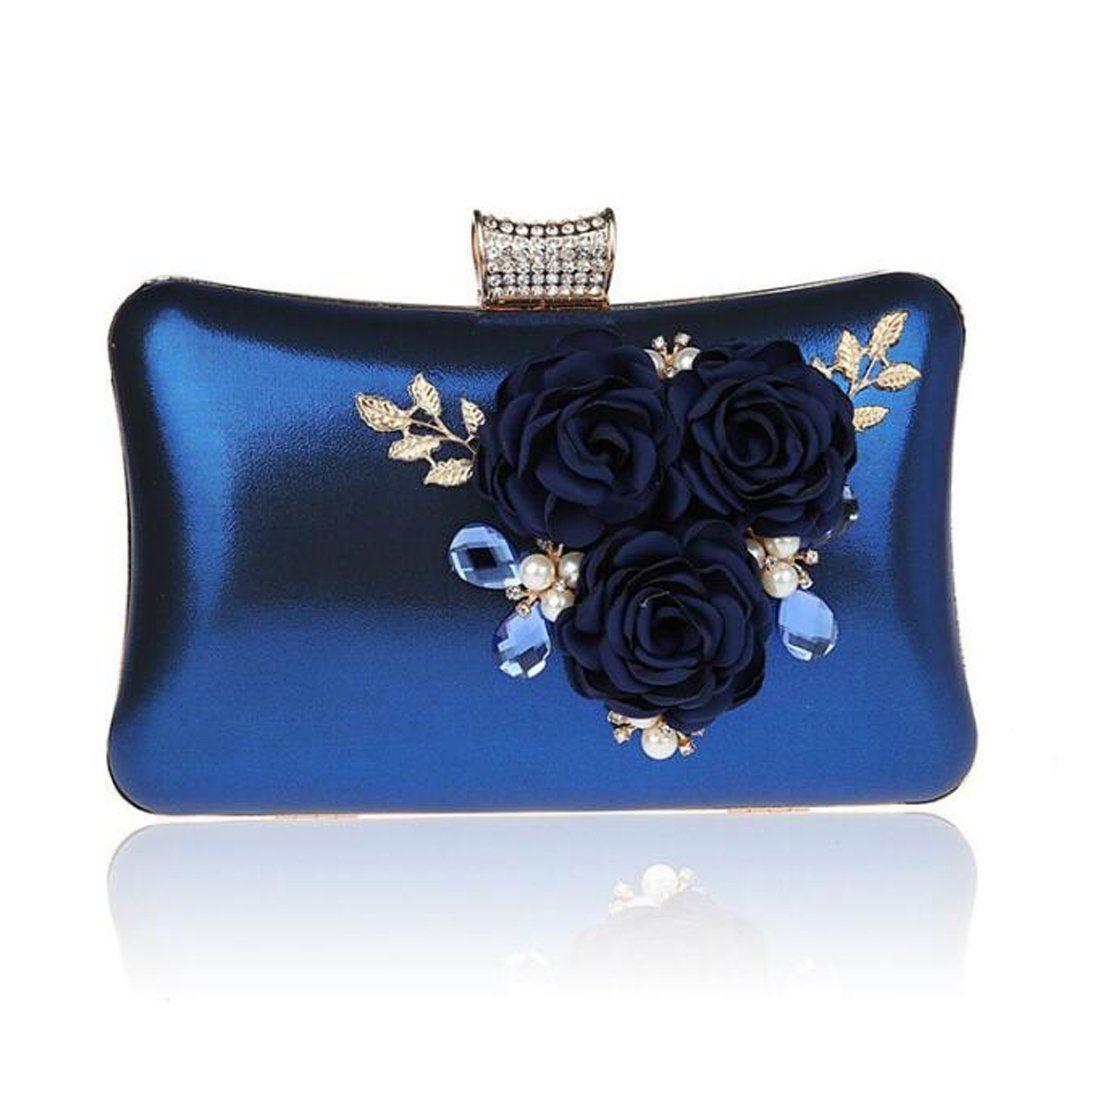 Women Clutch Bag Purse Evening Handbag Glitter Sequin Vintage Shoulder Bag For Bridal Wedding Party Prom Clubs Ladies Gift